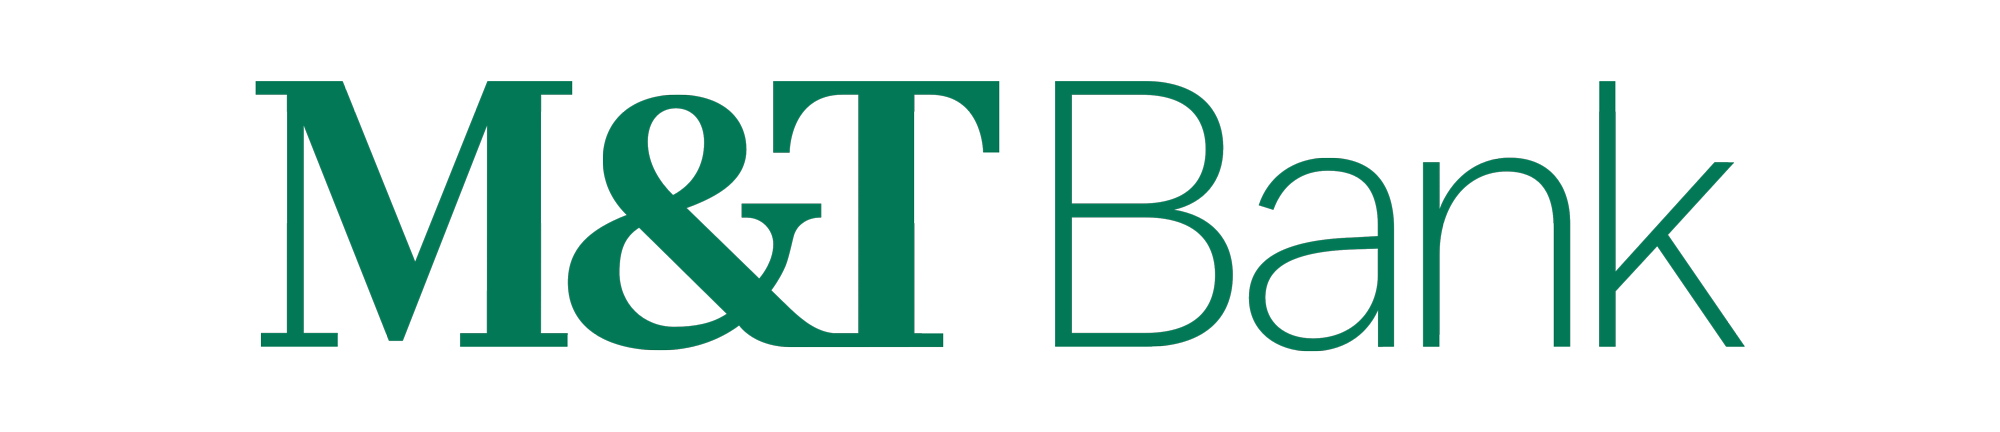 MT_Bank_logo-1